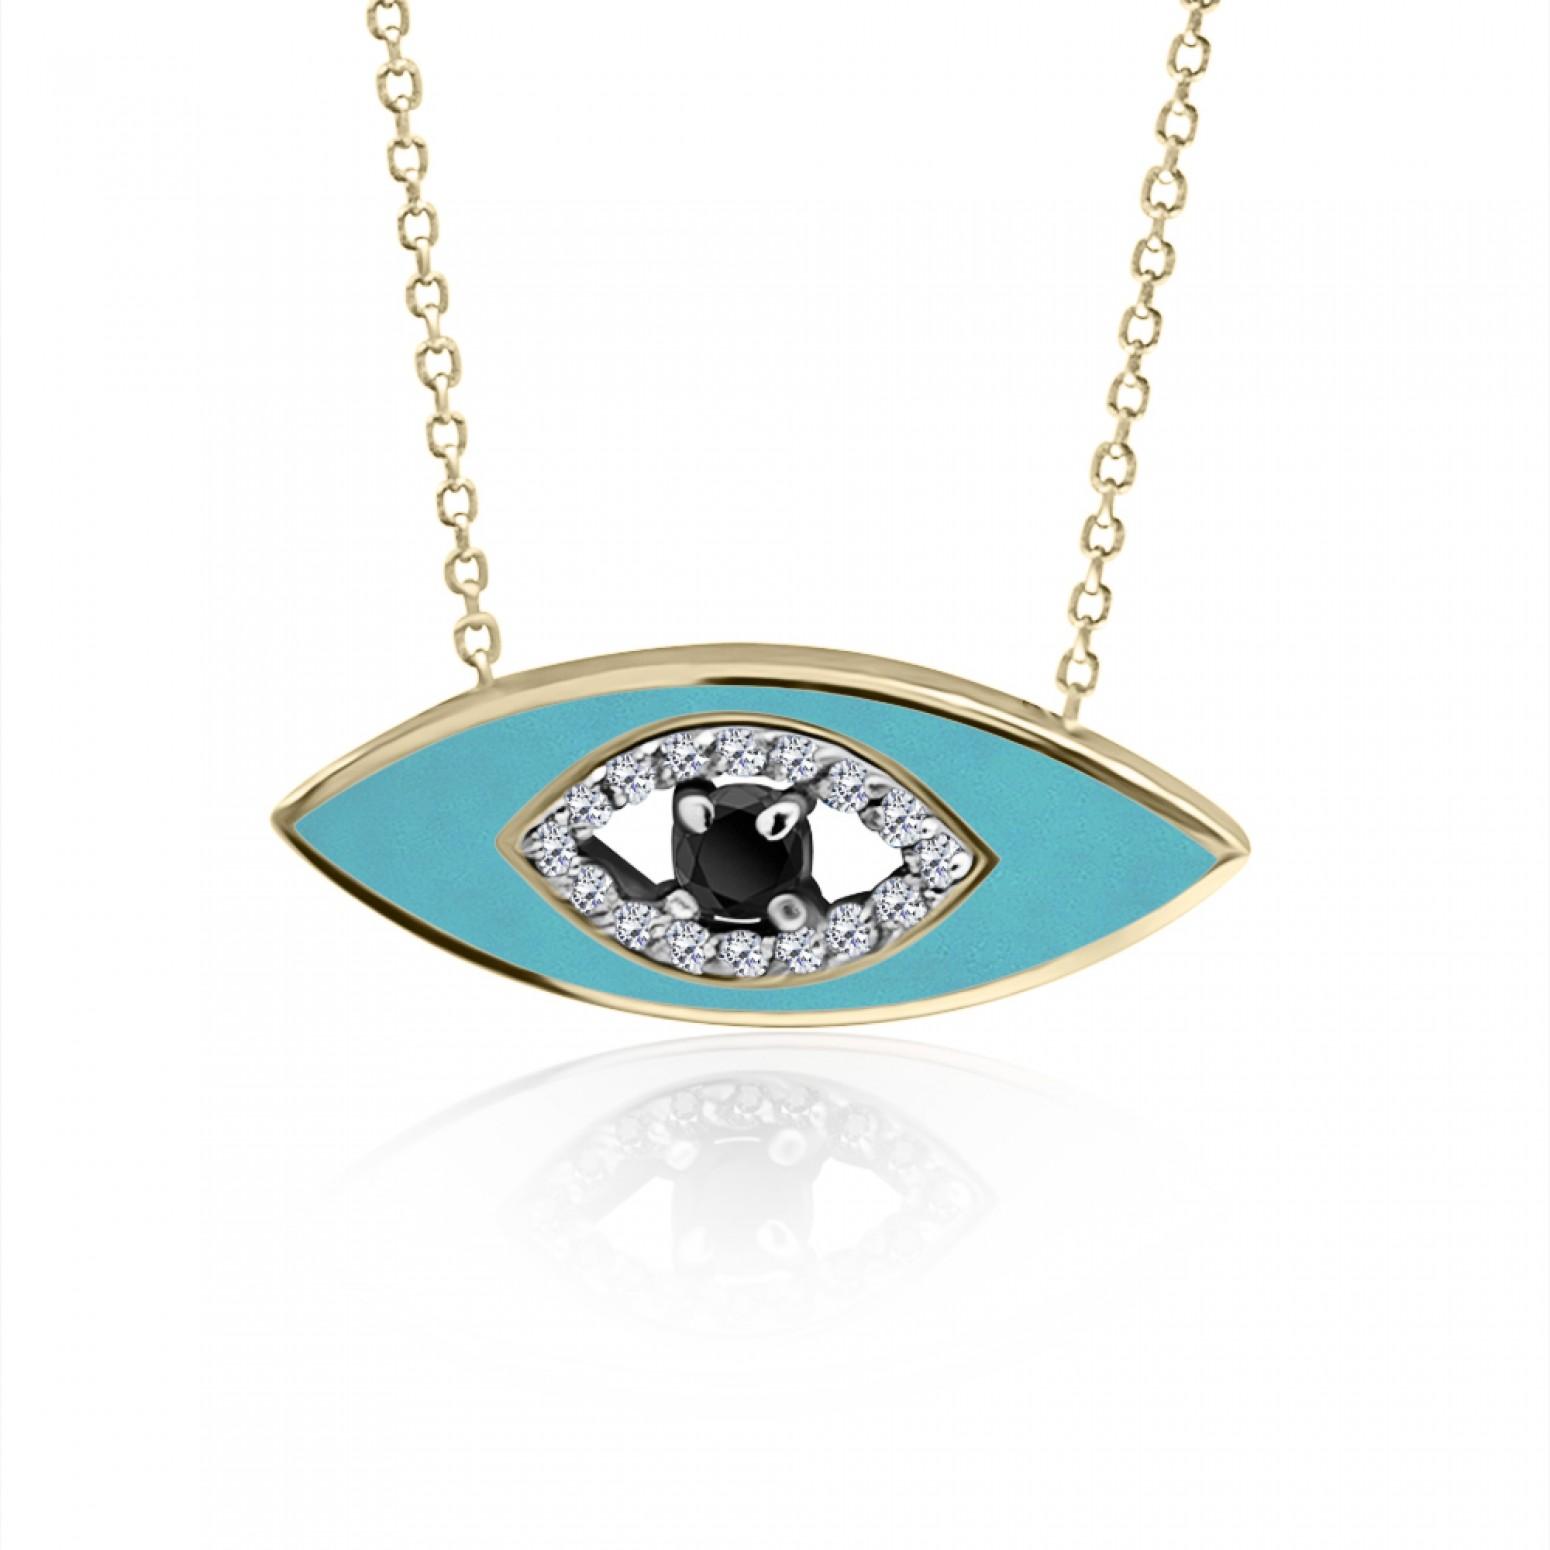 Eye necklace, Κ9 gold with white, black zircon and enamel, ko5024 NECKLACES Κοσμηματα - chrilia.gr